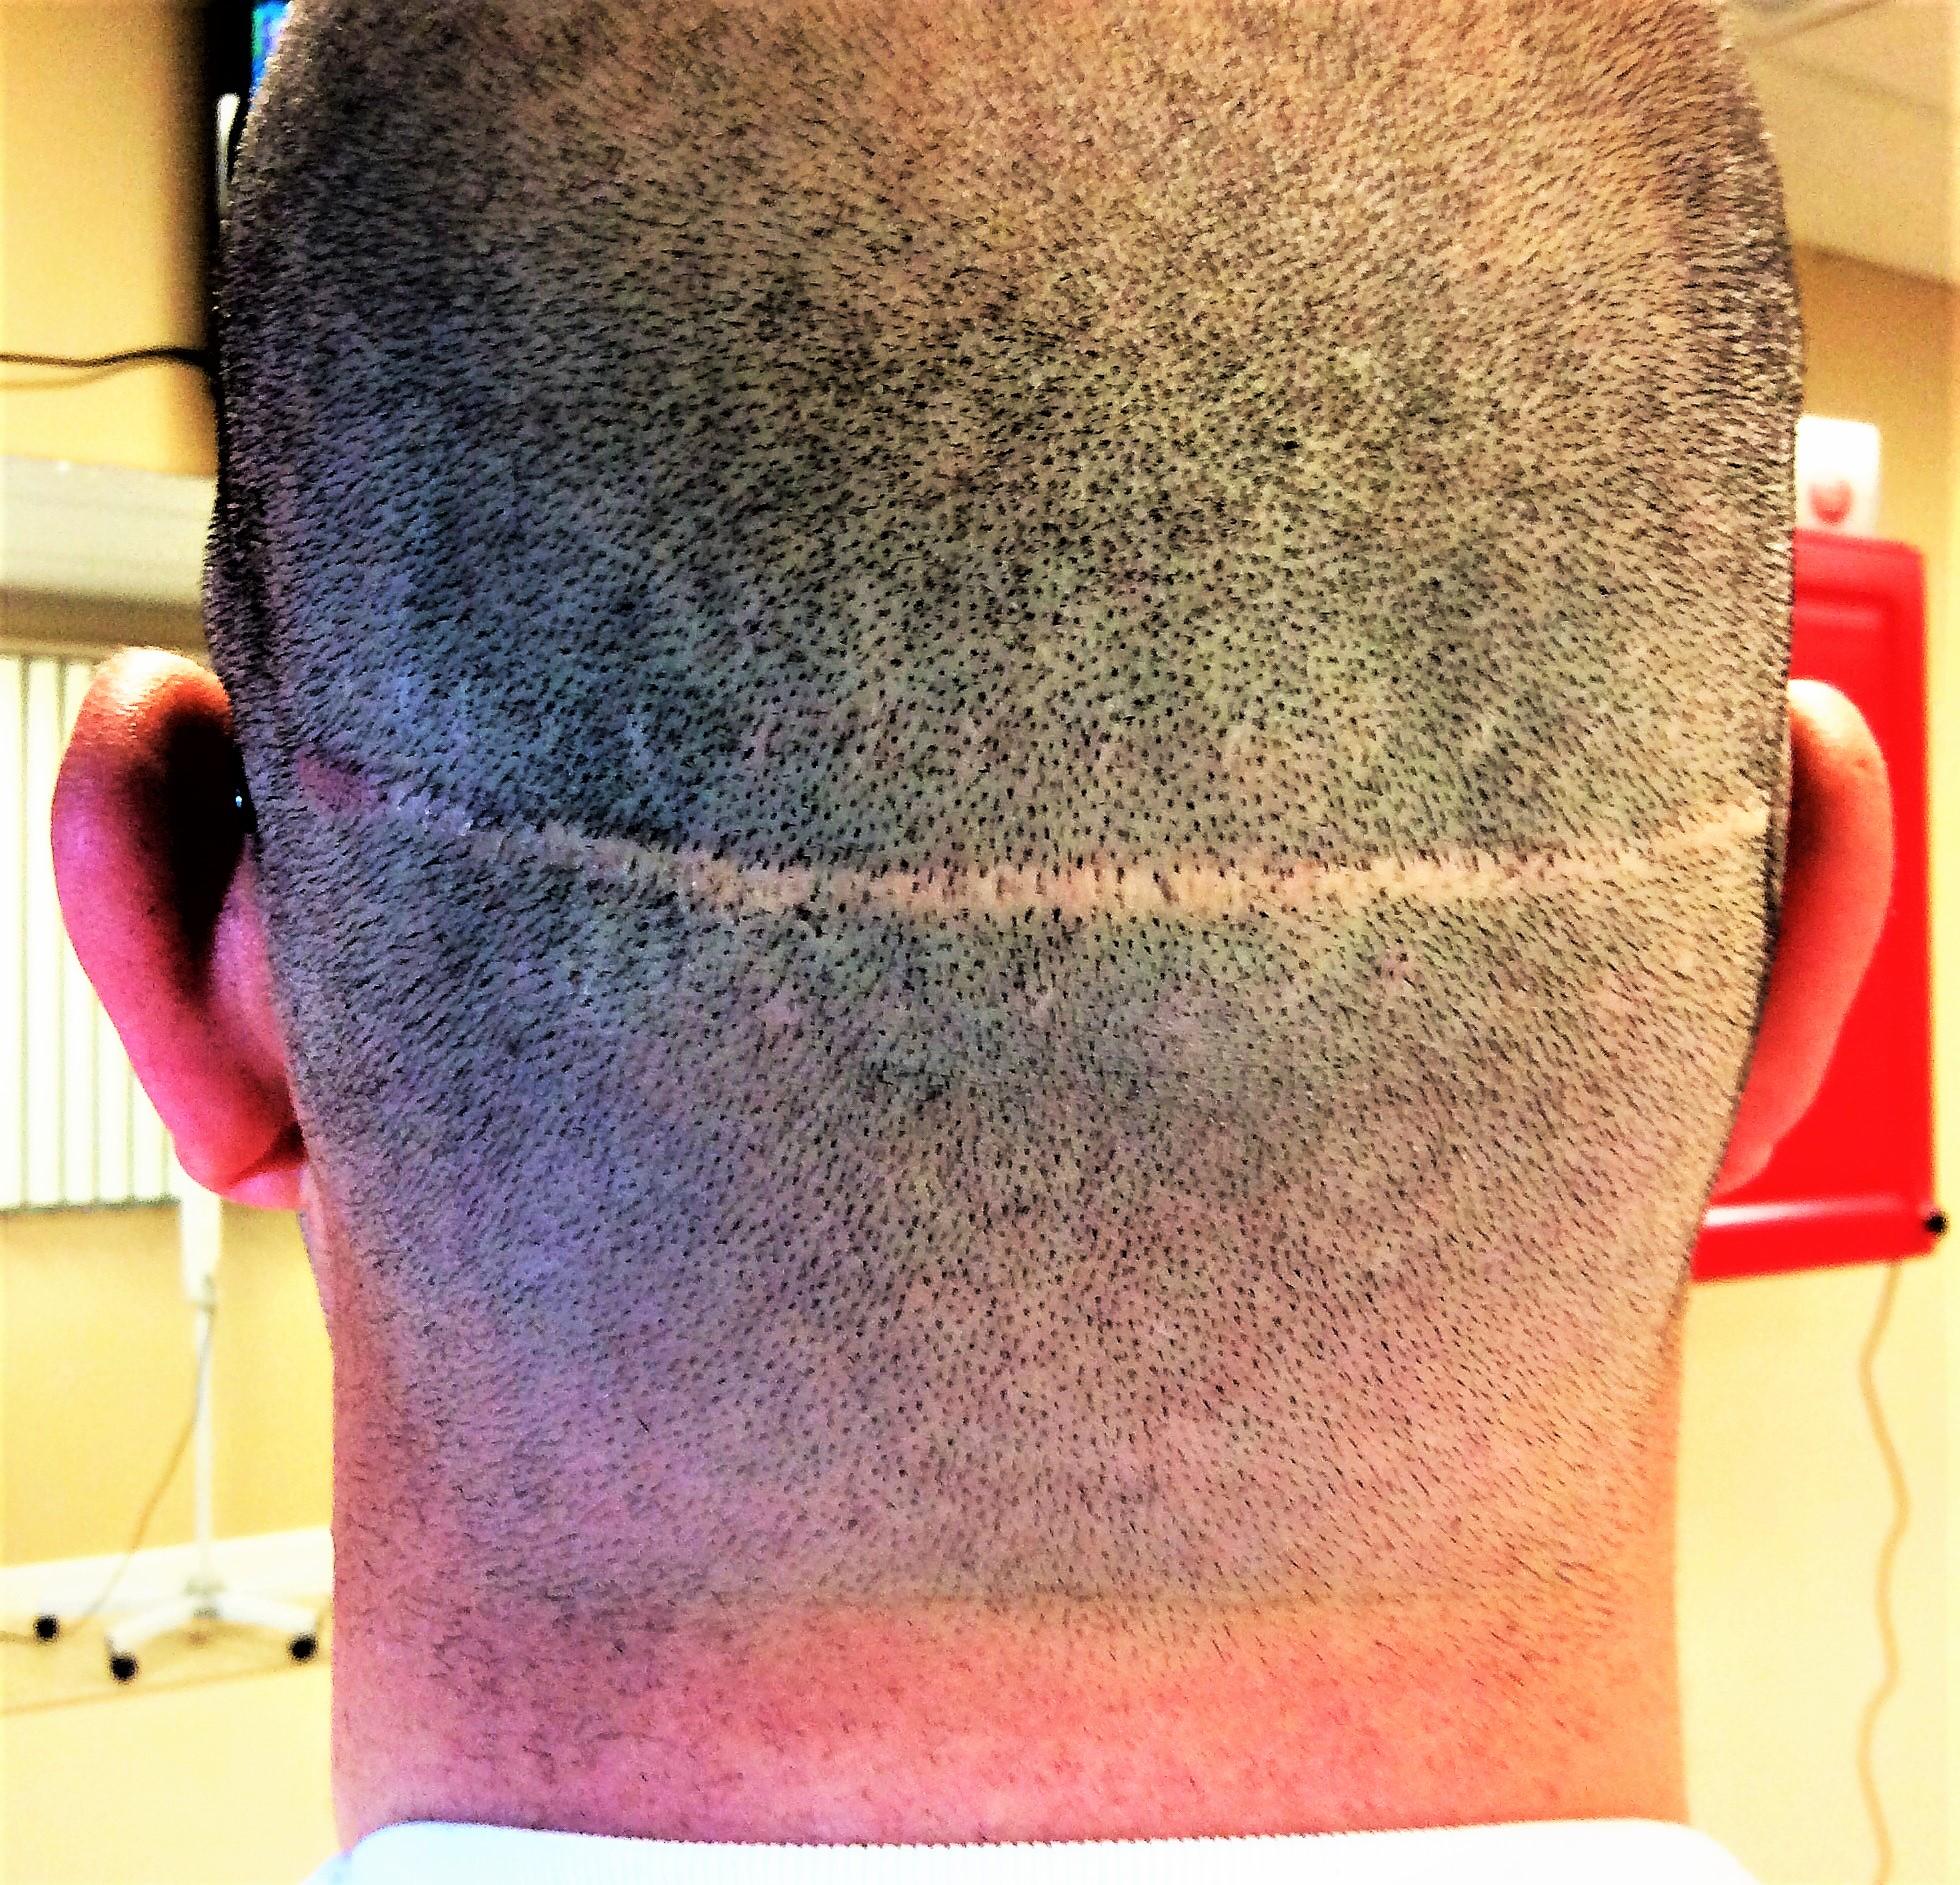 abc042b7 9aaf 413c 8044 3ba6f07920ba 300x289 - Scalp Micropigmentation vs. Hair Transplant Surgery – Which Is Better?